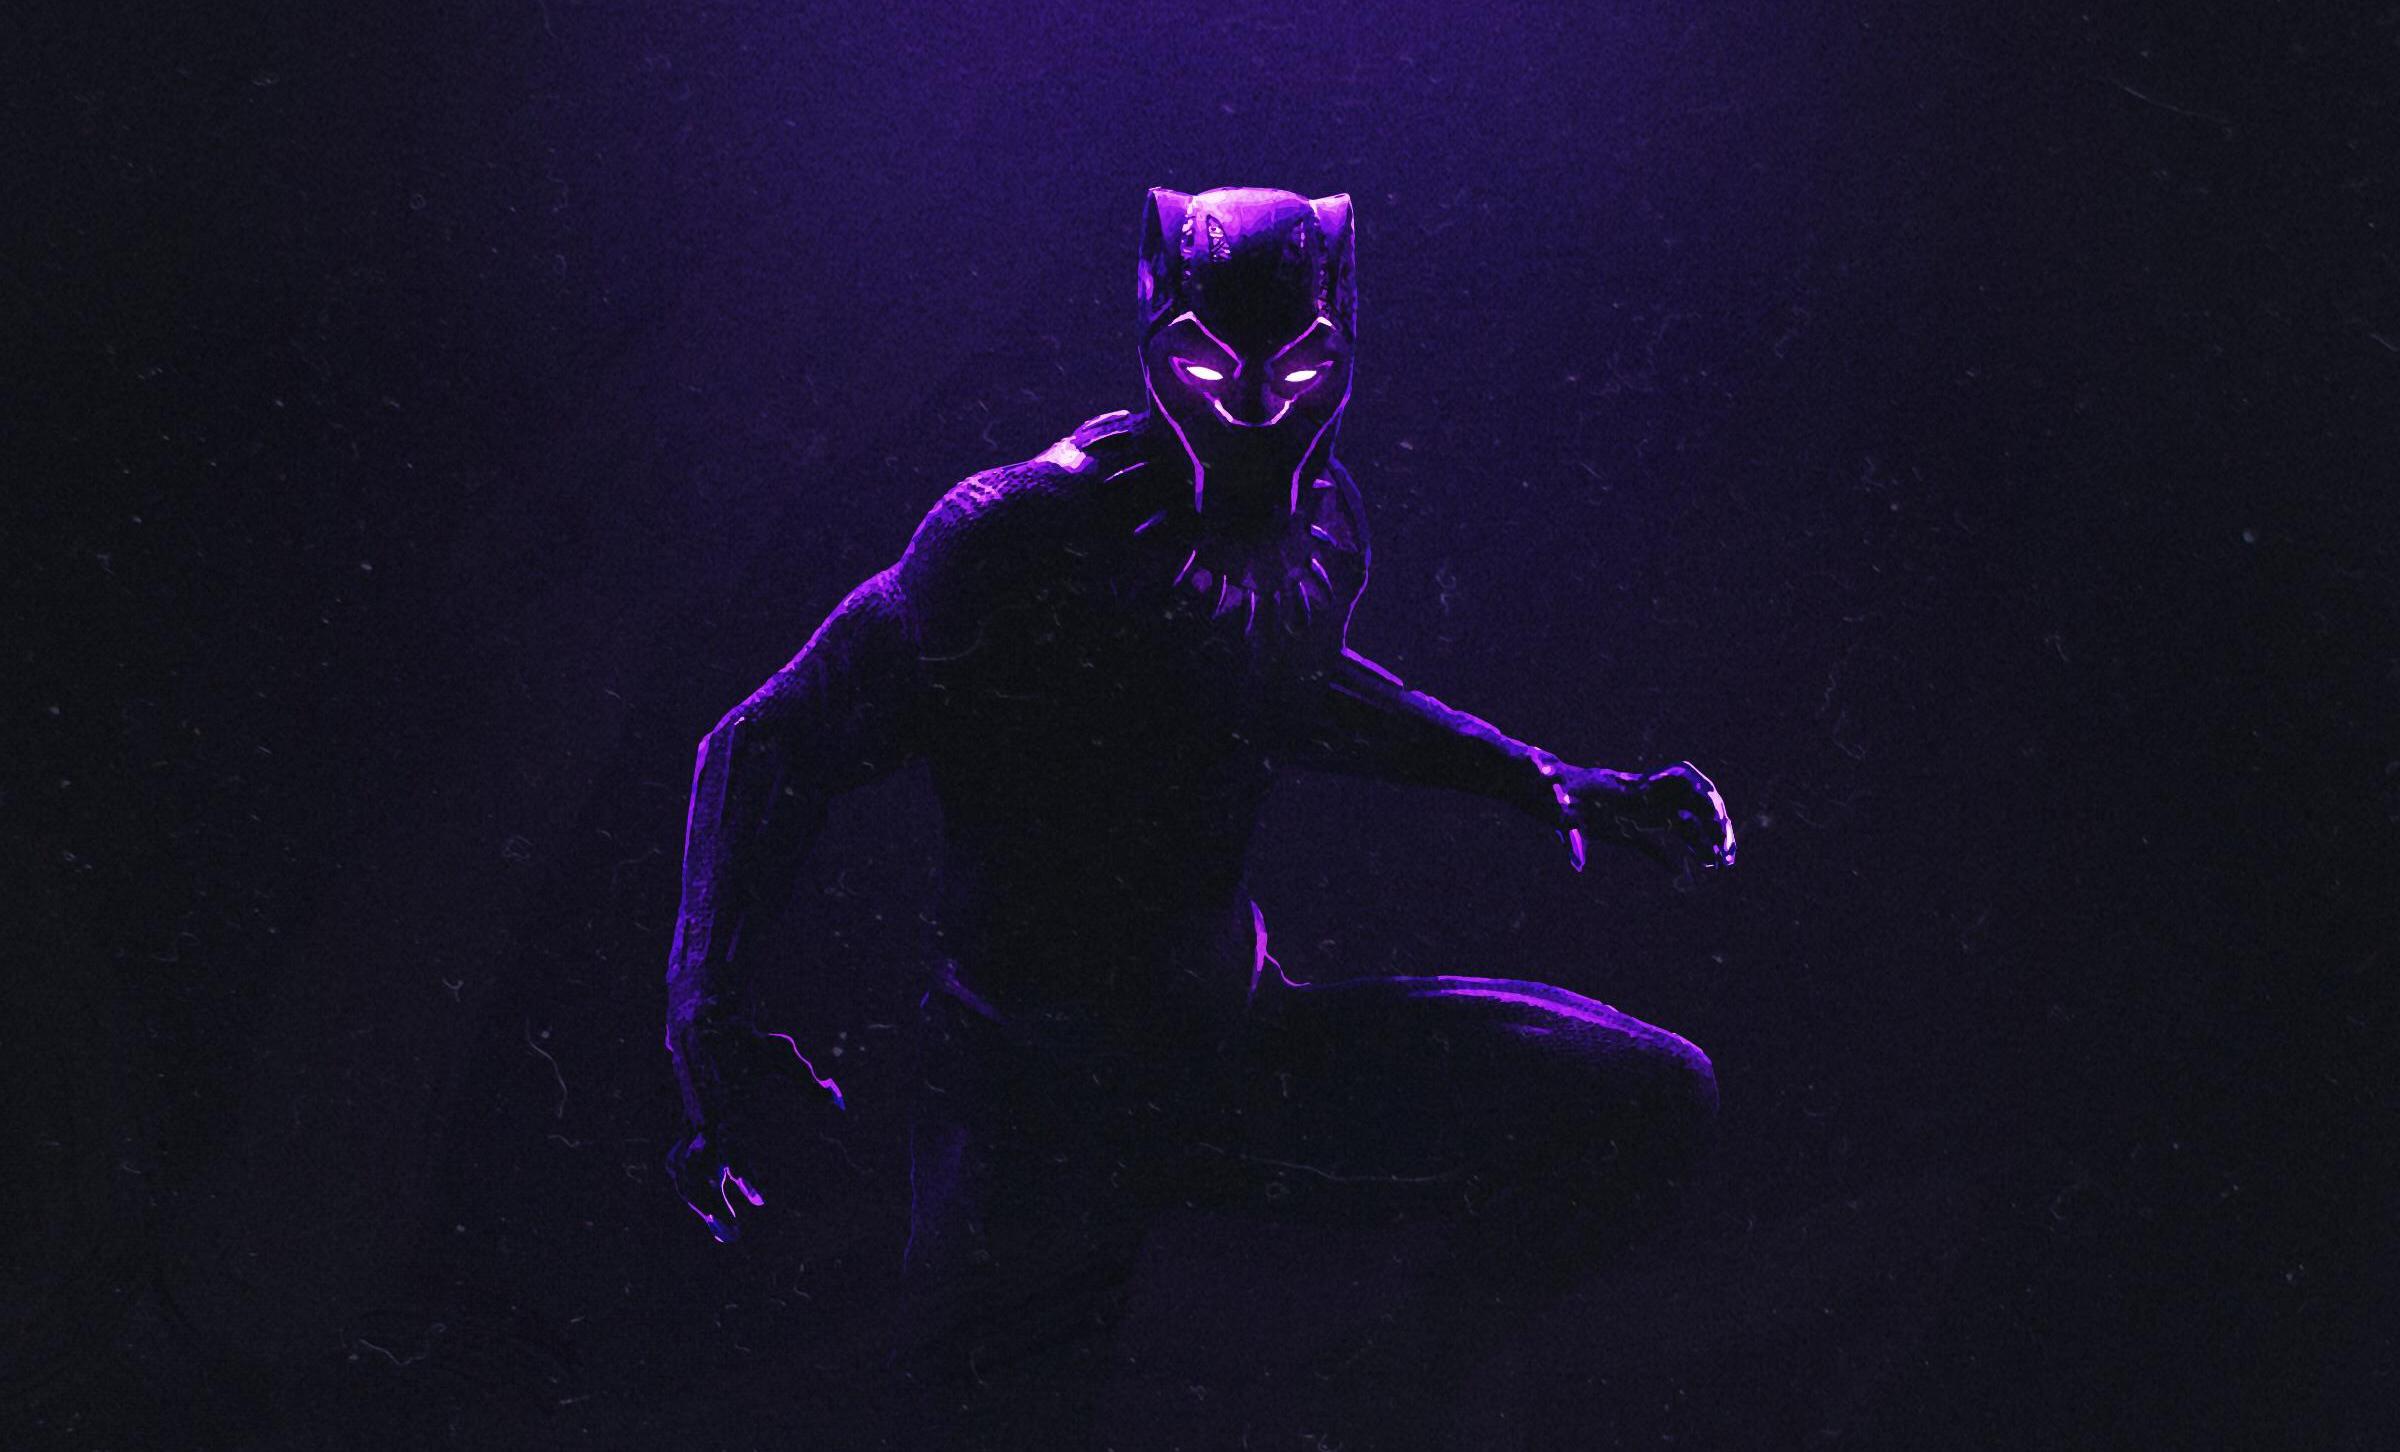 Fondos 4k Hd De Panteras Negras: Black Panther Fan Made Art, HD Movies, 4k Wallpapers